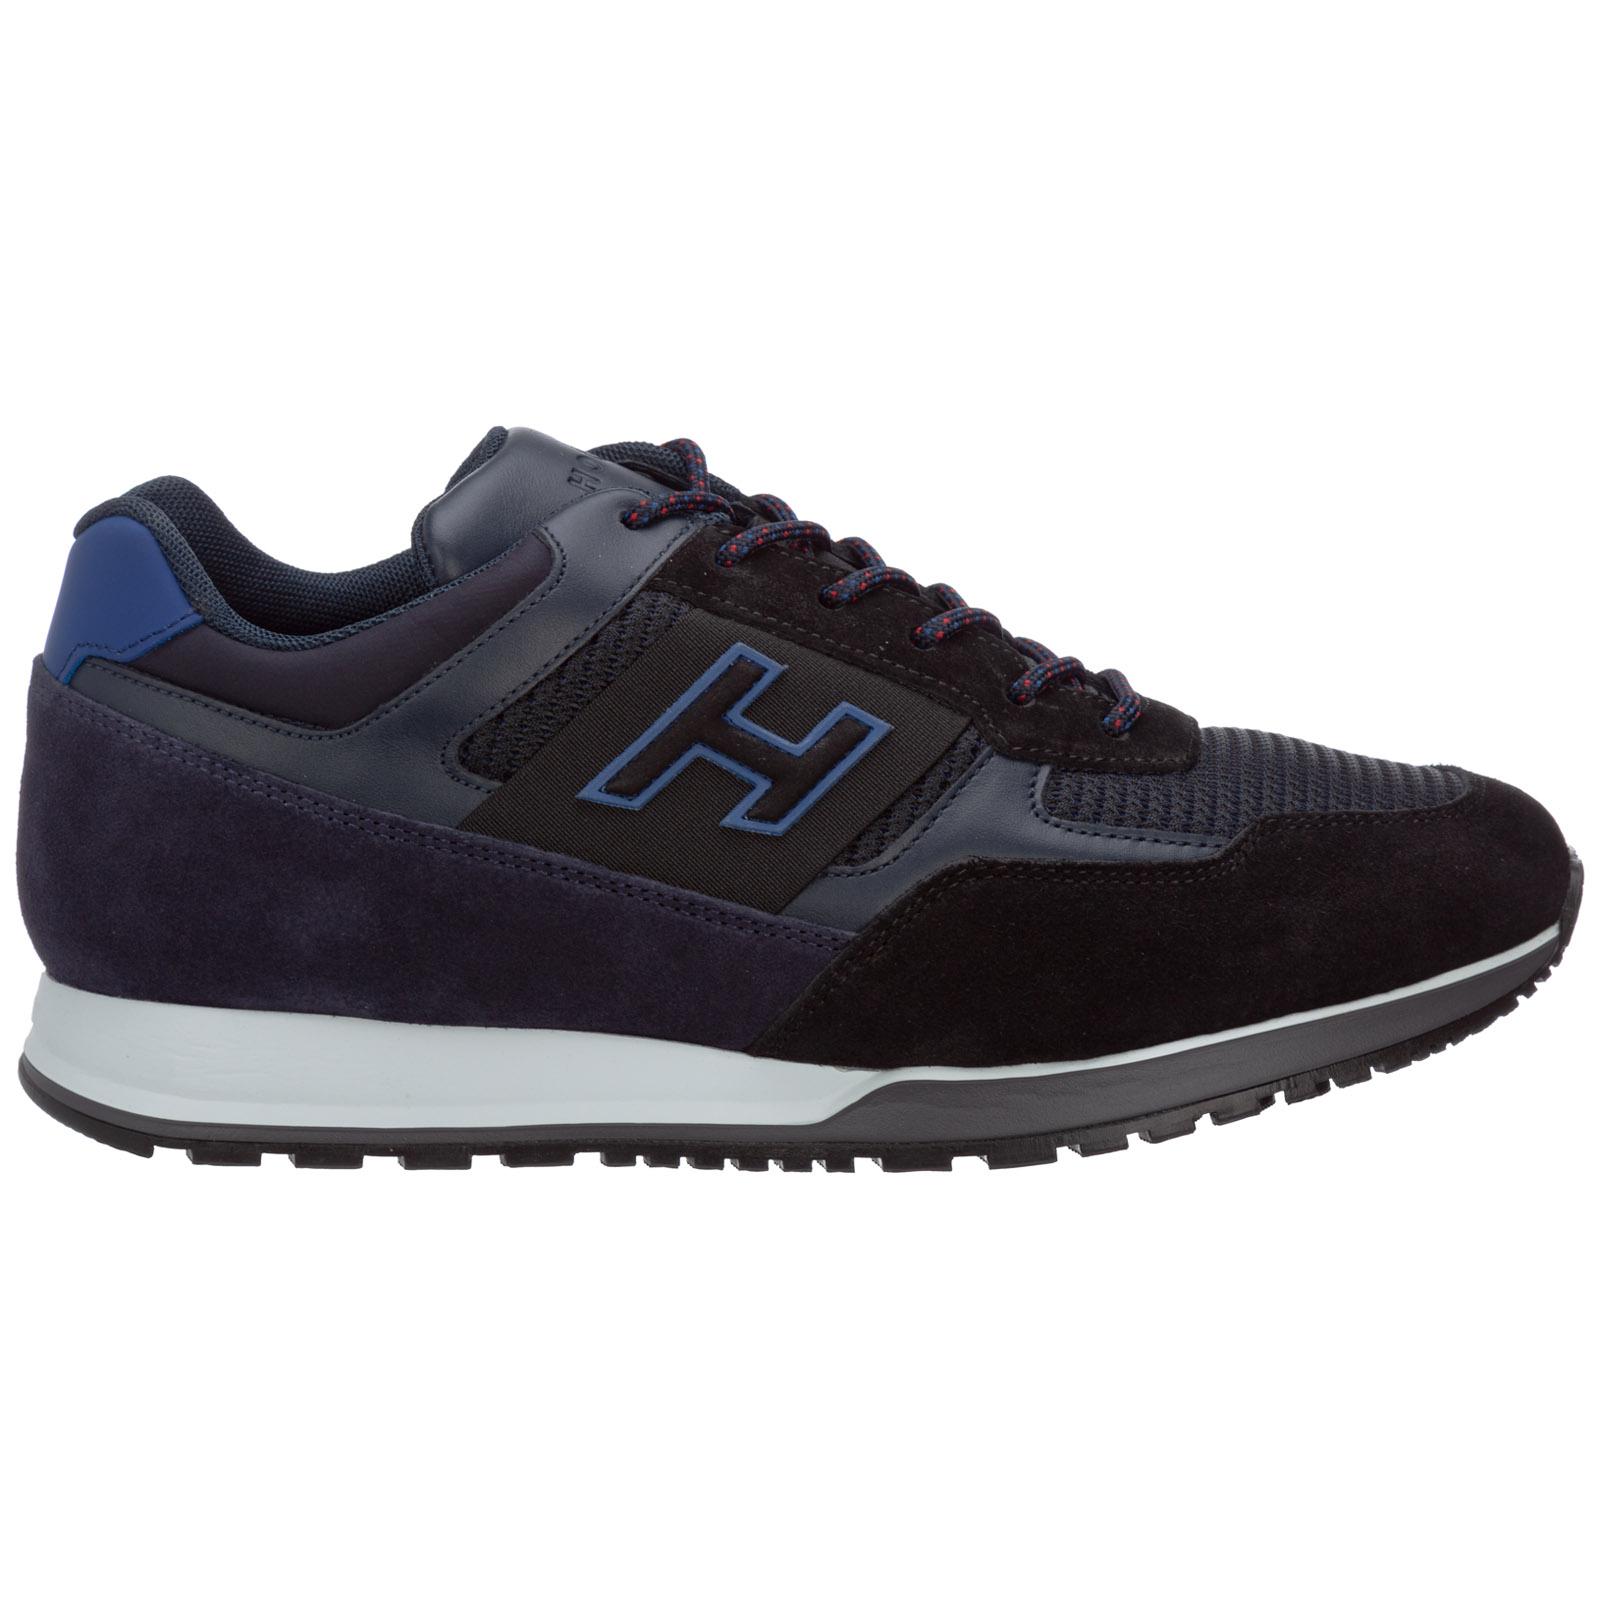 Sneakers Hogan H321 HXM3210K790O9M815Z